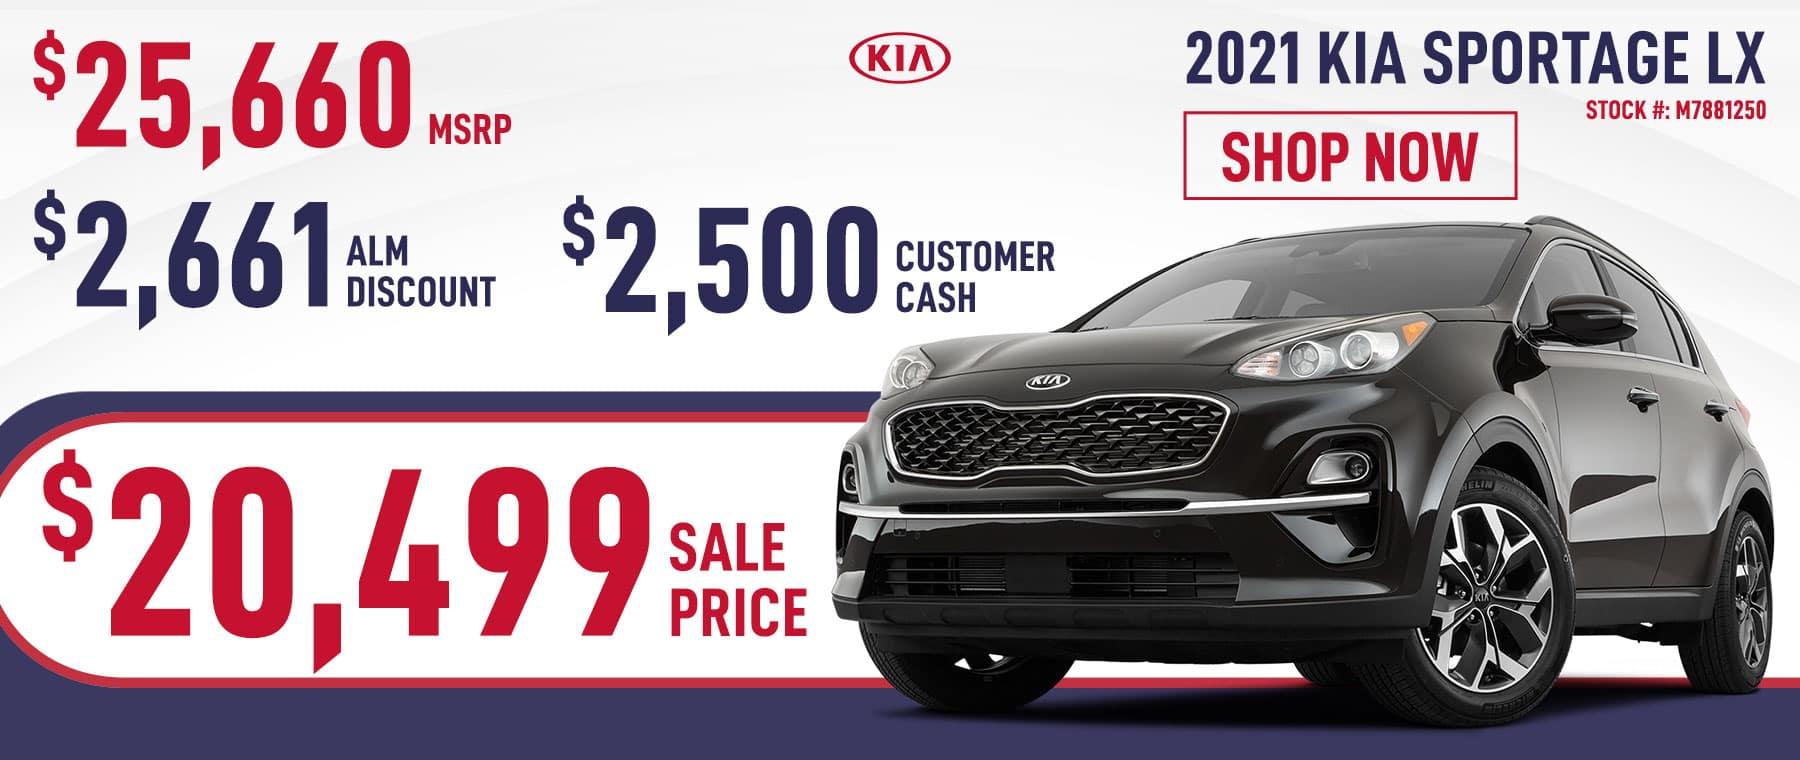 2021 Kia Sportage LX Sale Price $20,499